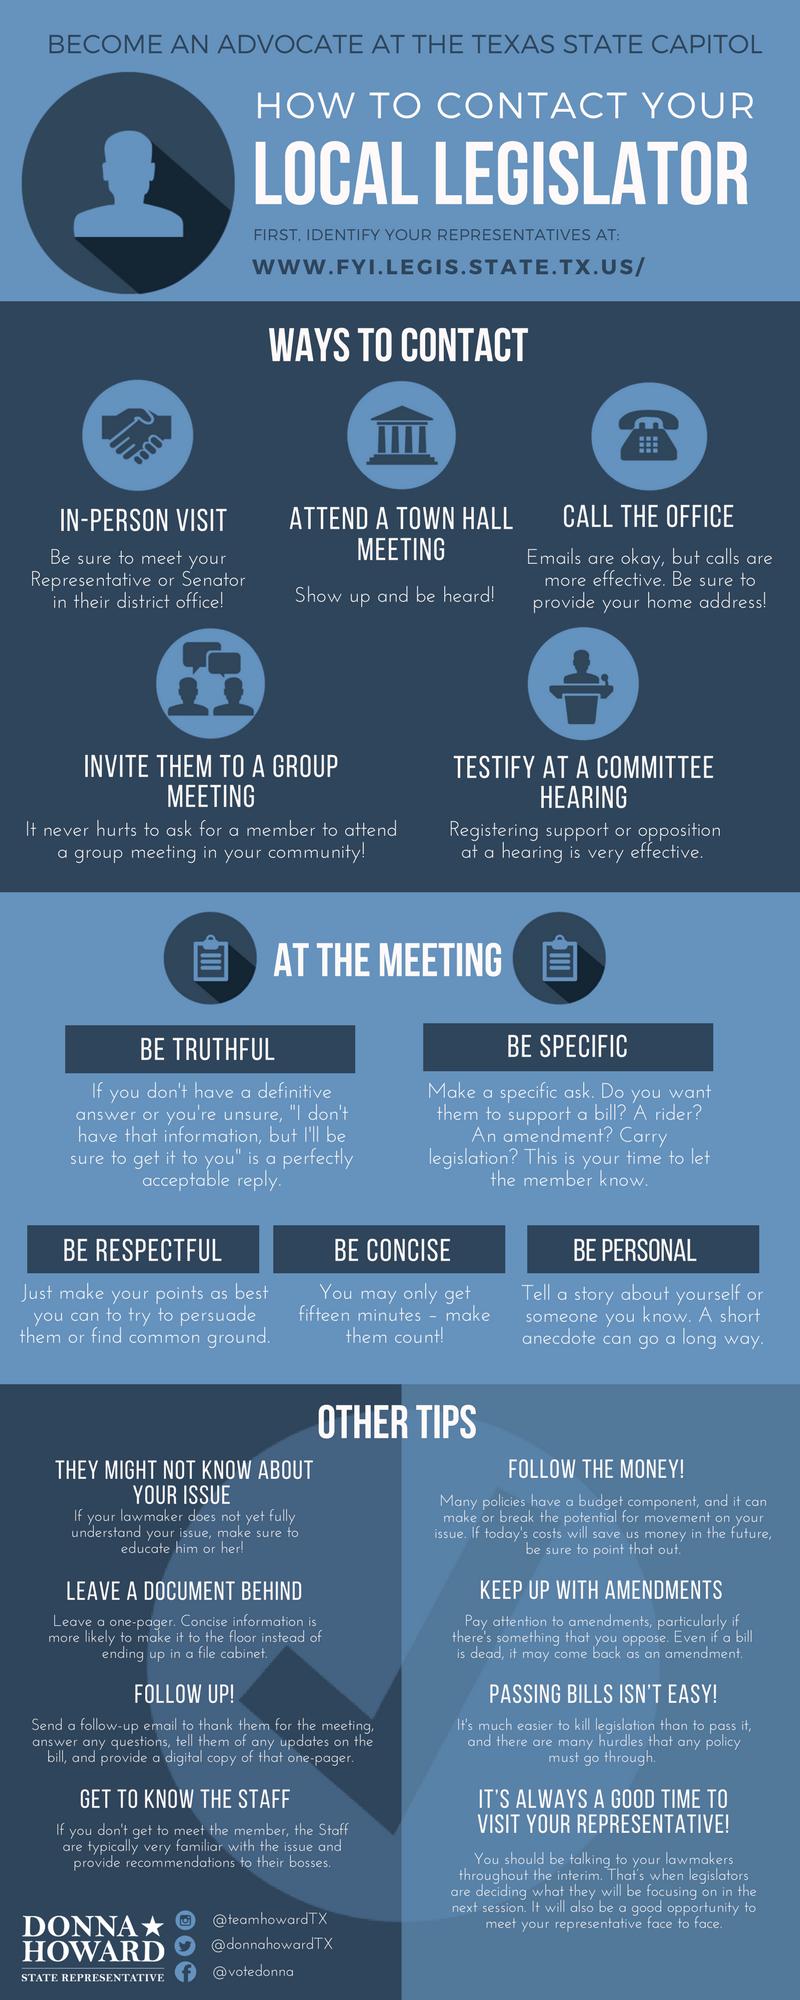 How To Contact Your Legislator